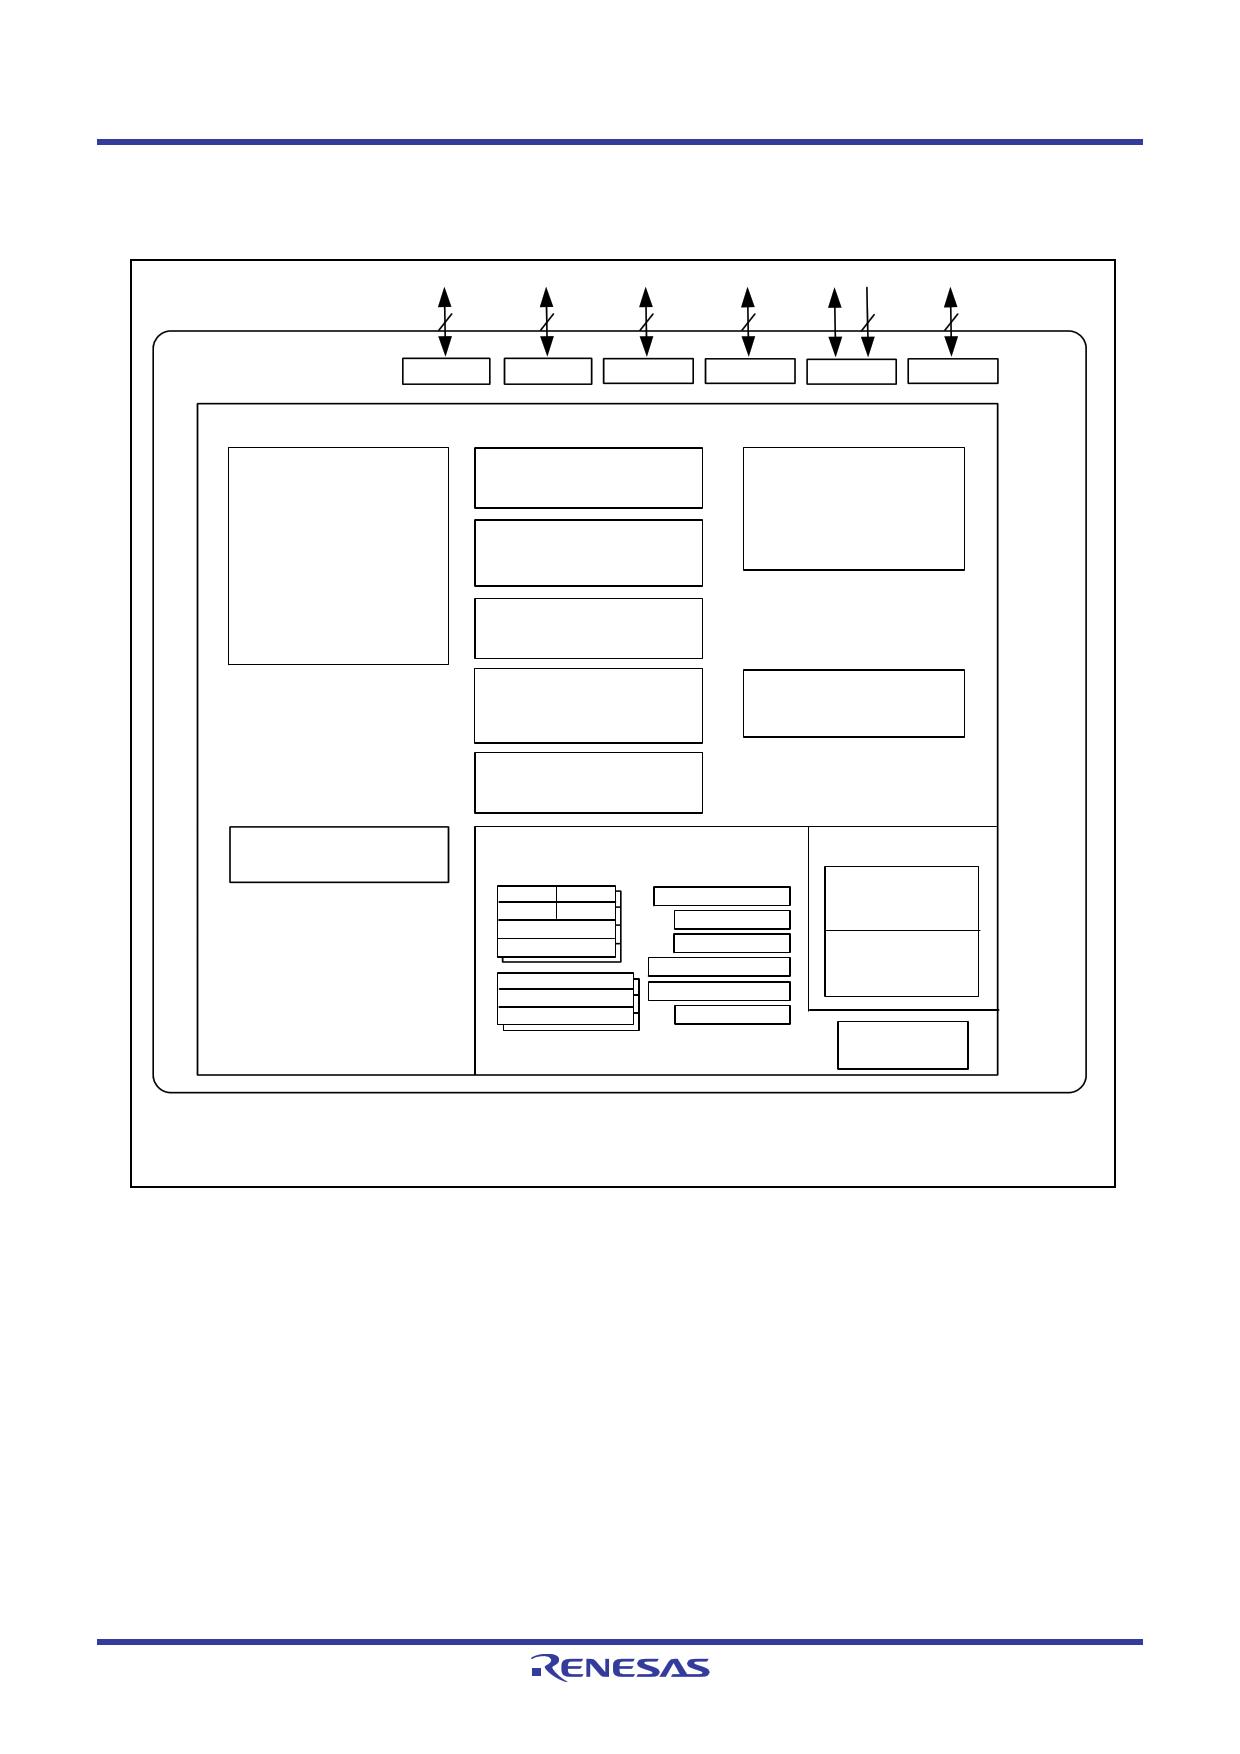 R5F21227KFP pdf, 반도체, 판매, 대치품